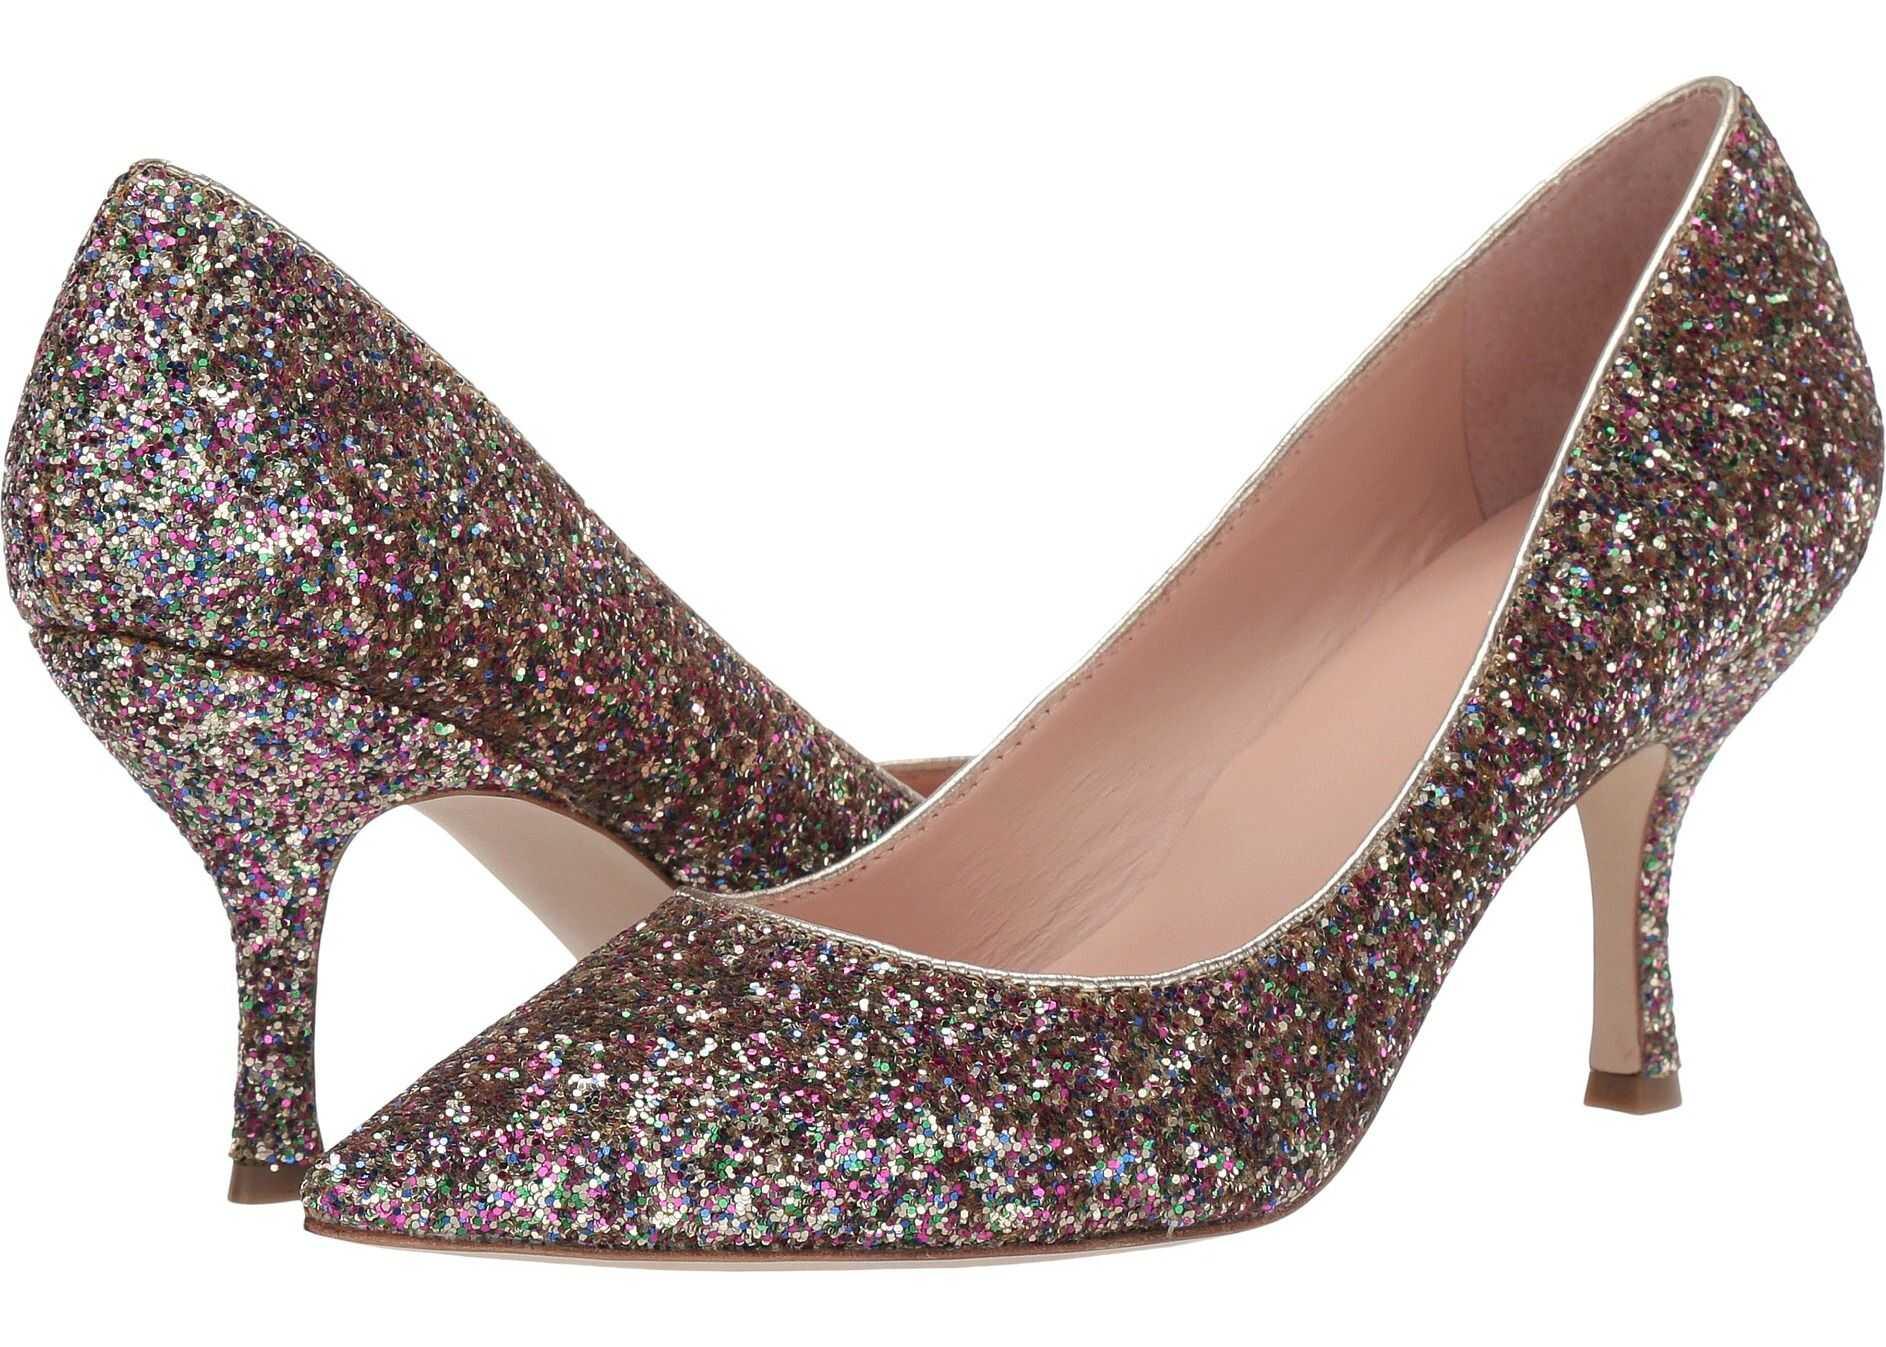 Kate Spade New York Sonia Multi Glitter